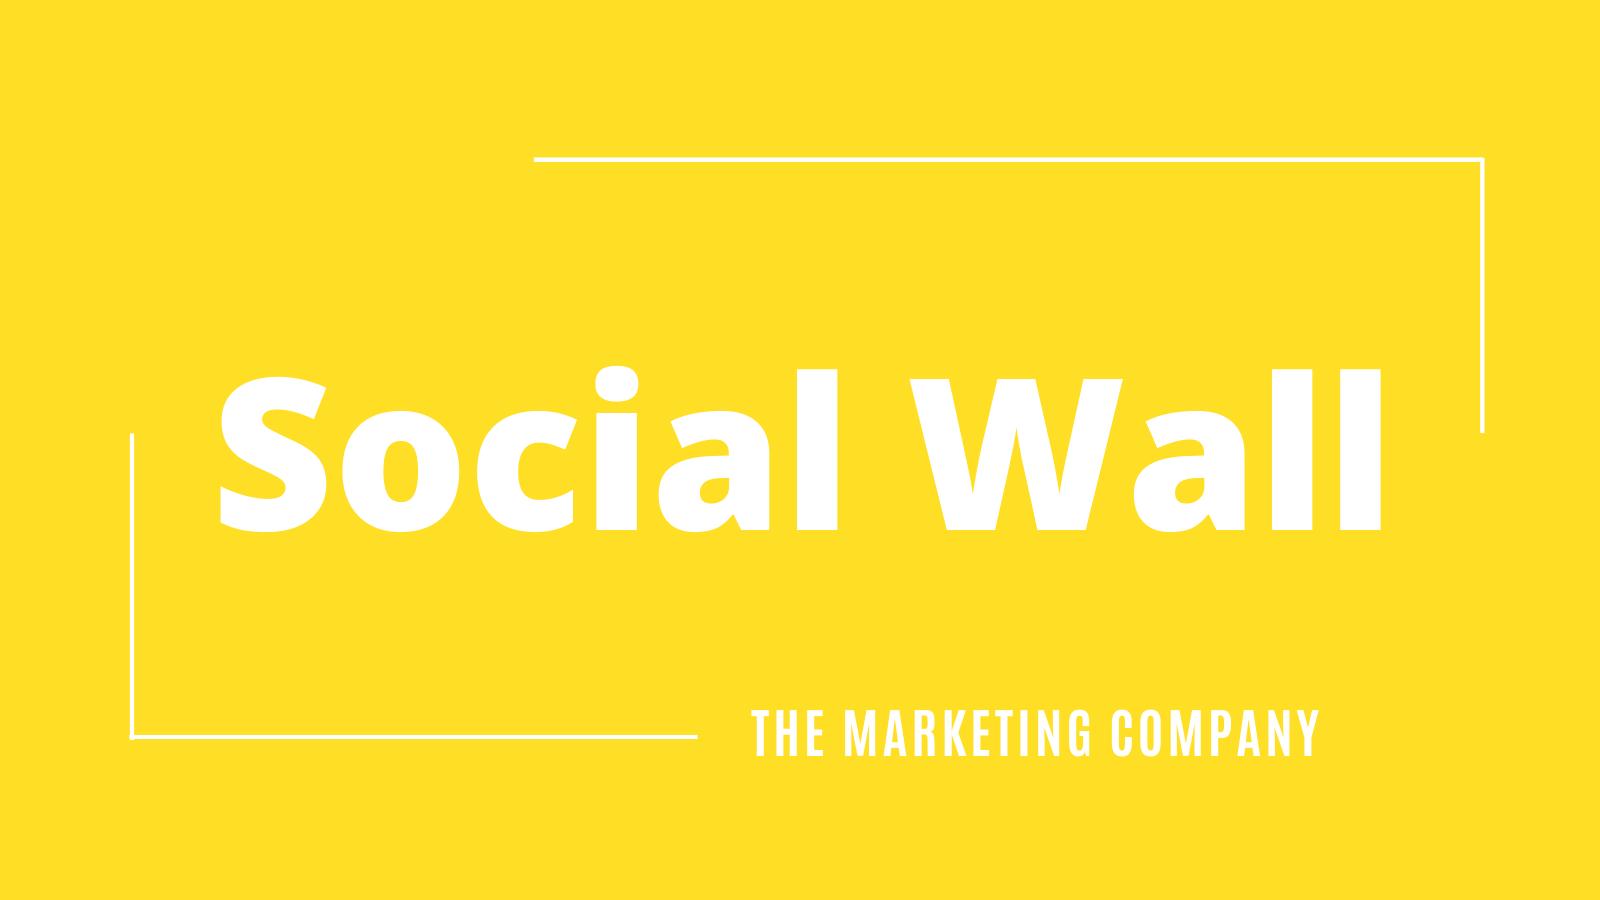 Social Wall